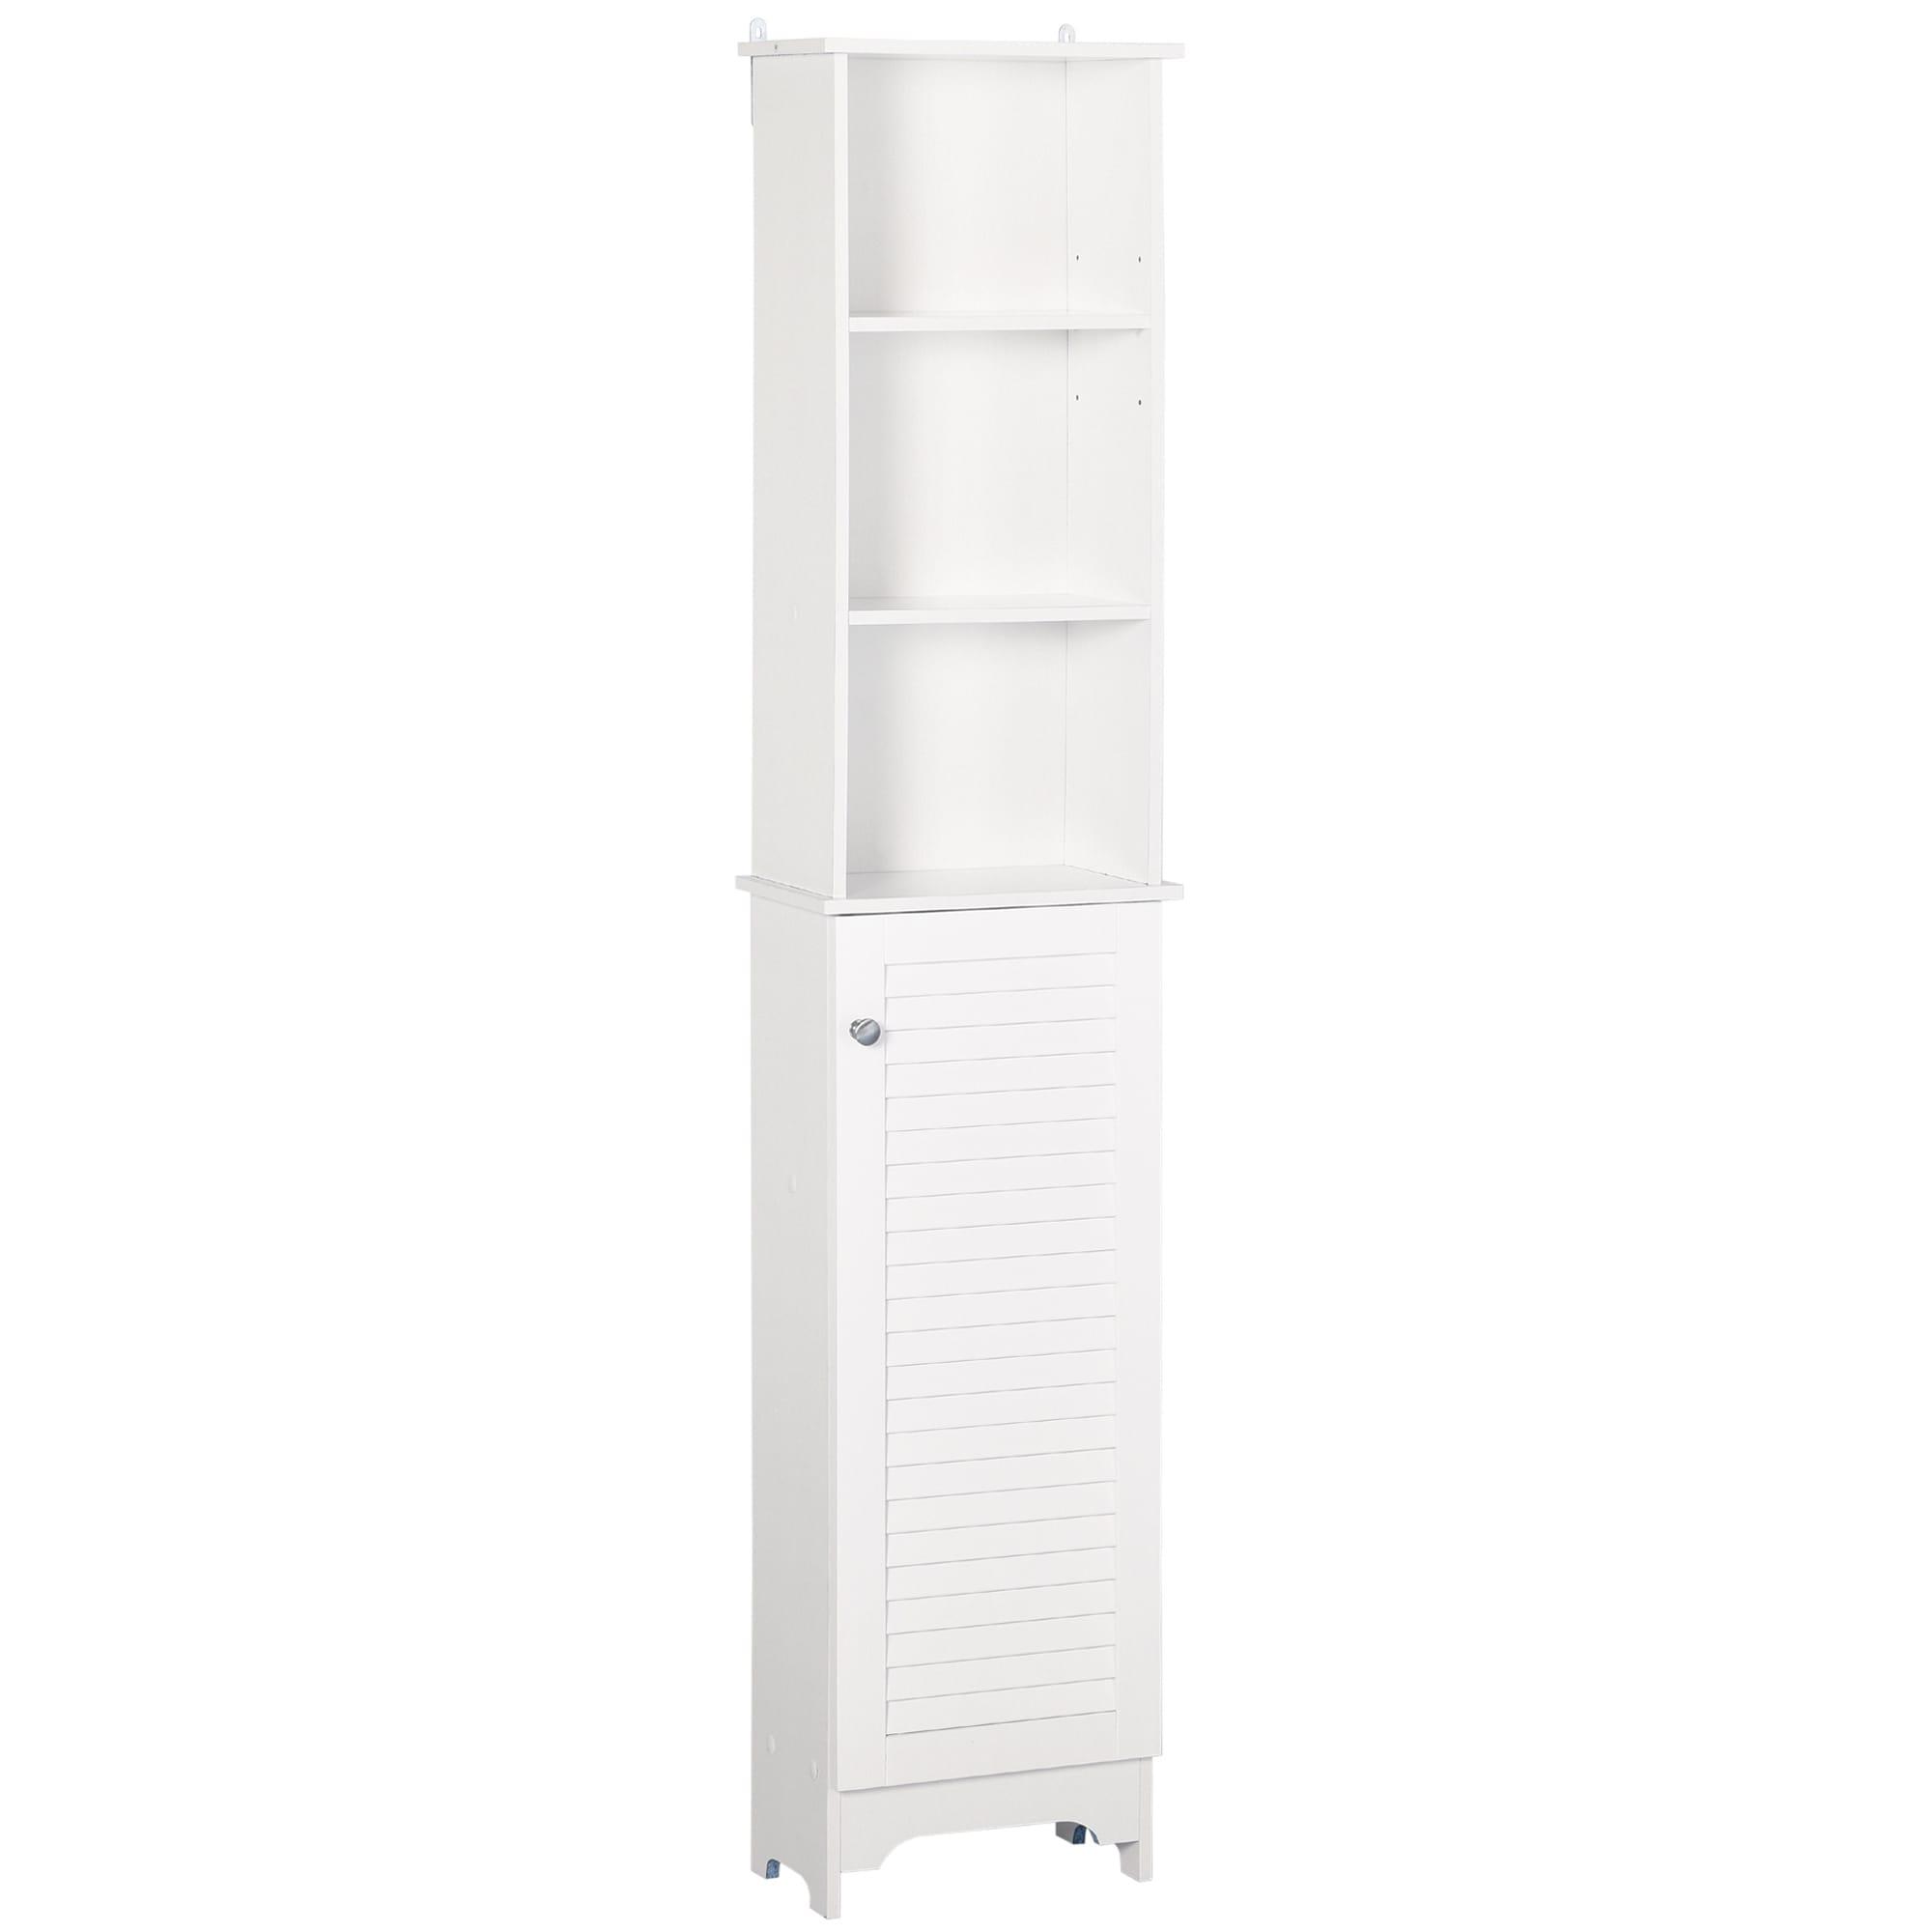 Homcom Freestanding Bathroom Tall Storage Cabinet Organizer Tower Cupboard Adjustable Shelves Wooden Furniture White Overstock 31688313